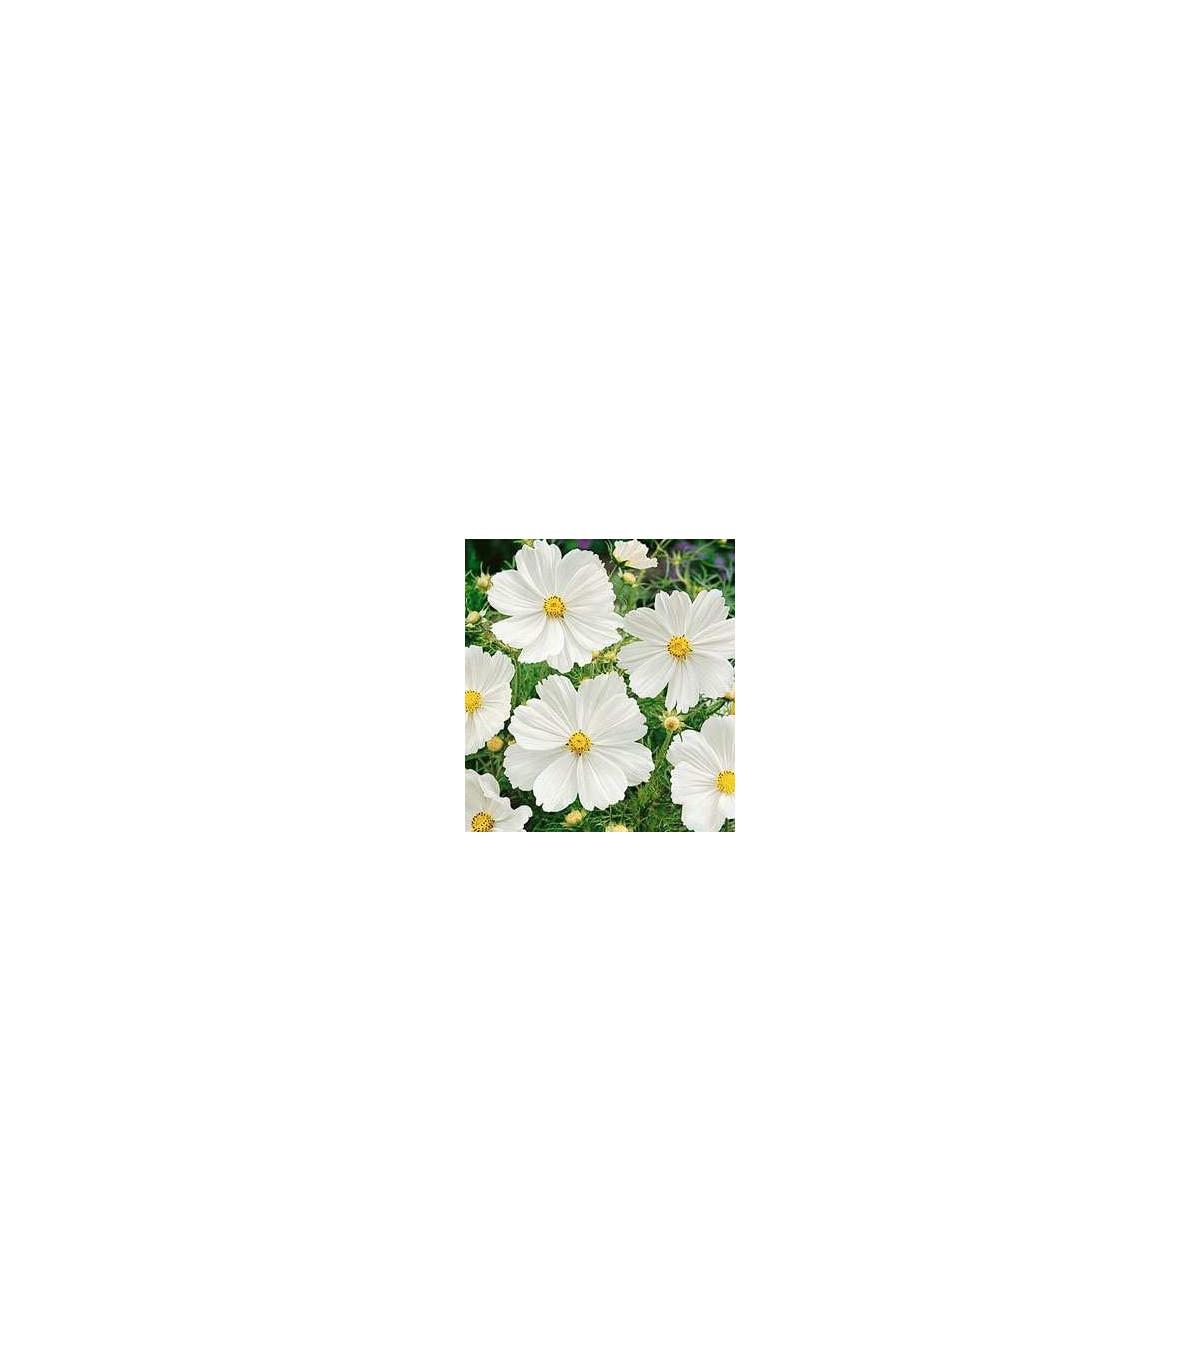 Krasuľka perovitá Biela senzácia - Cosmos bipinnatus - semená krasuľky - semiačka - 40 ks